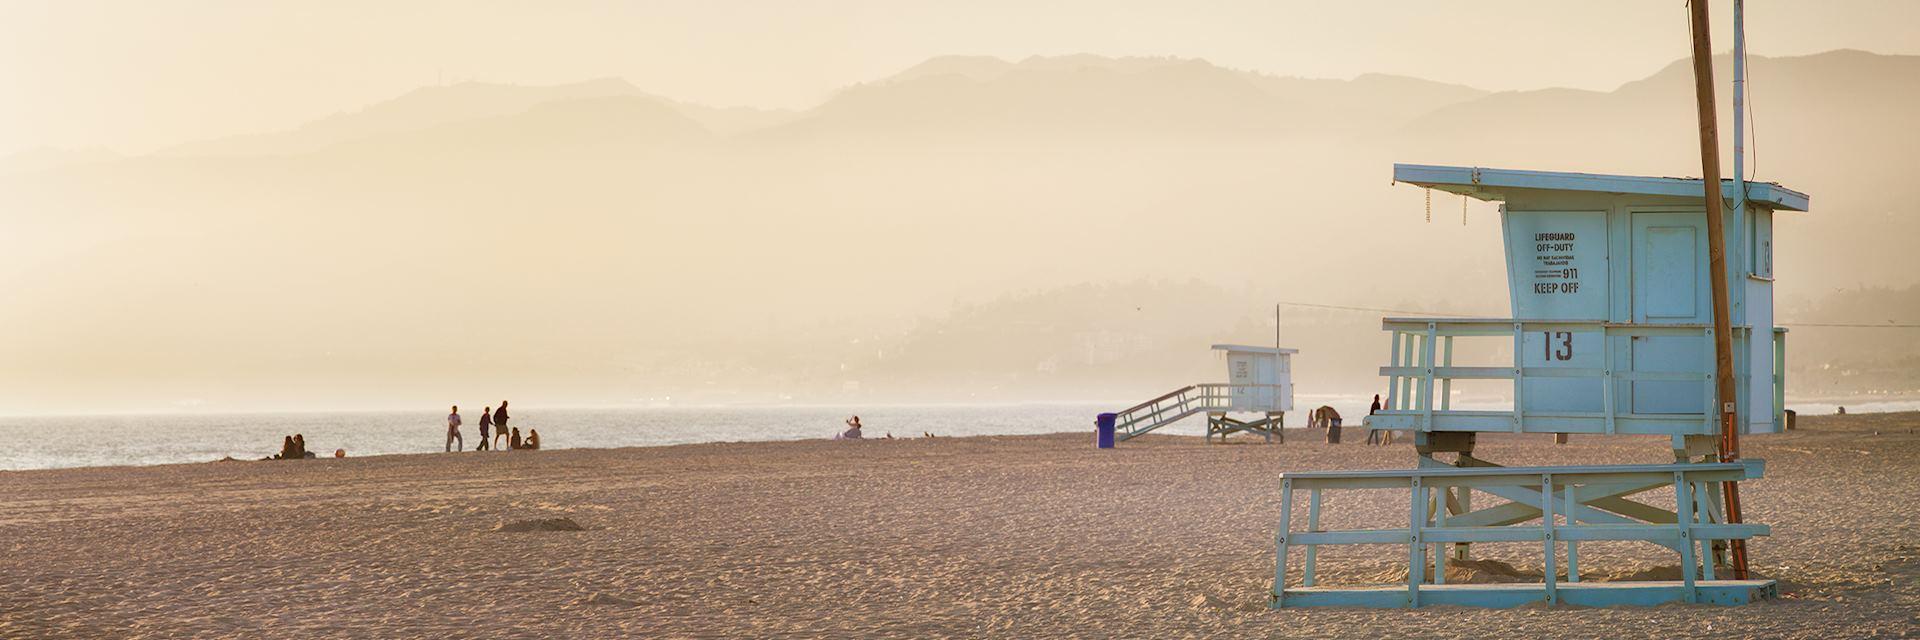 Lifeguard cabin at sunset on Santa Monica beach